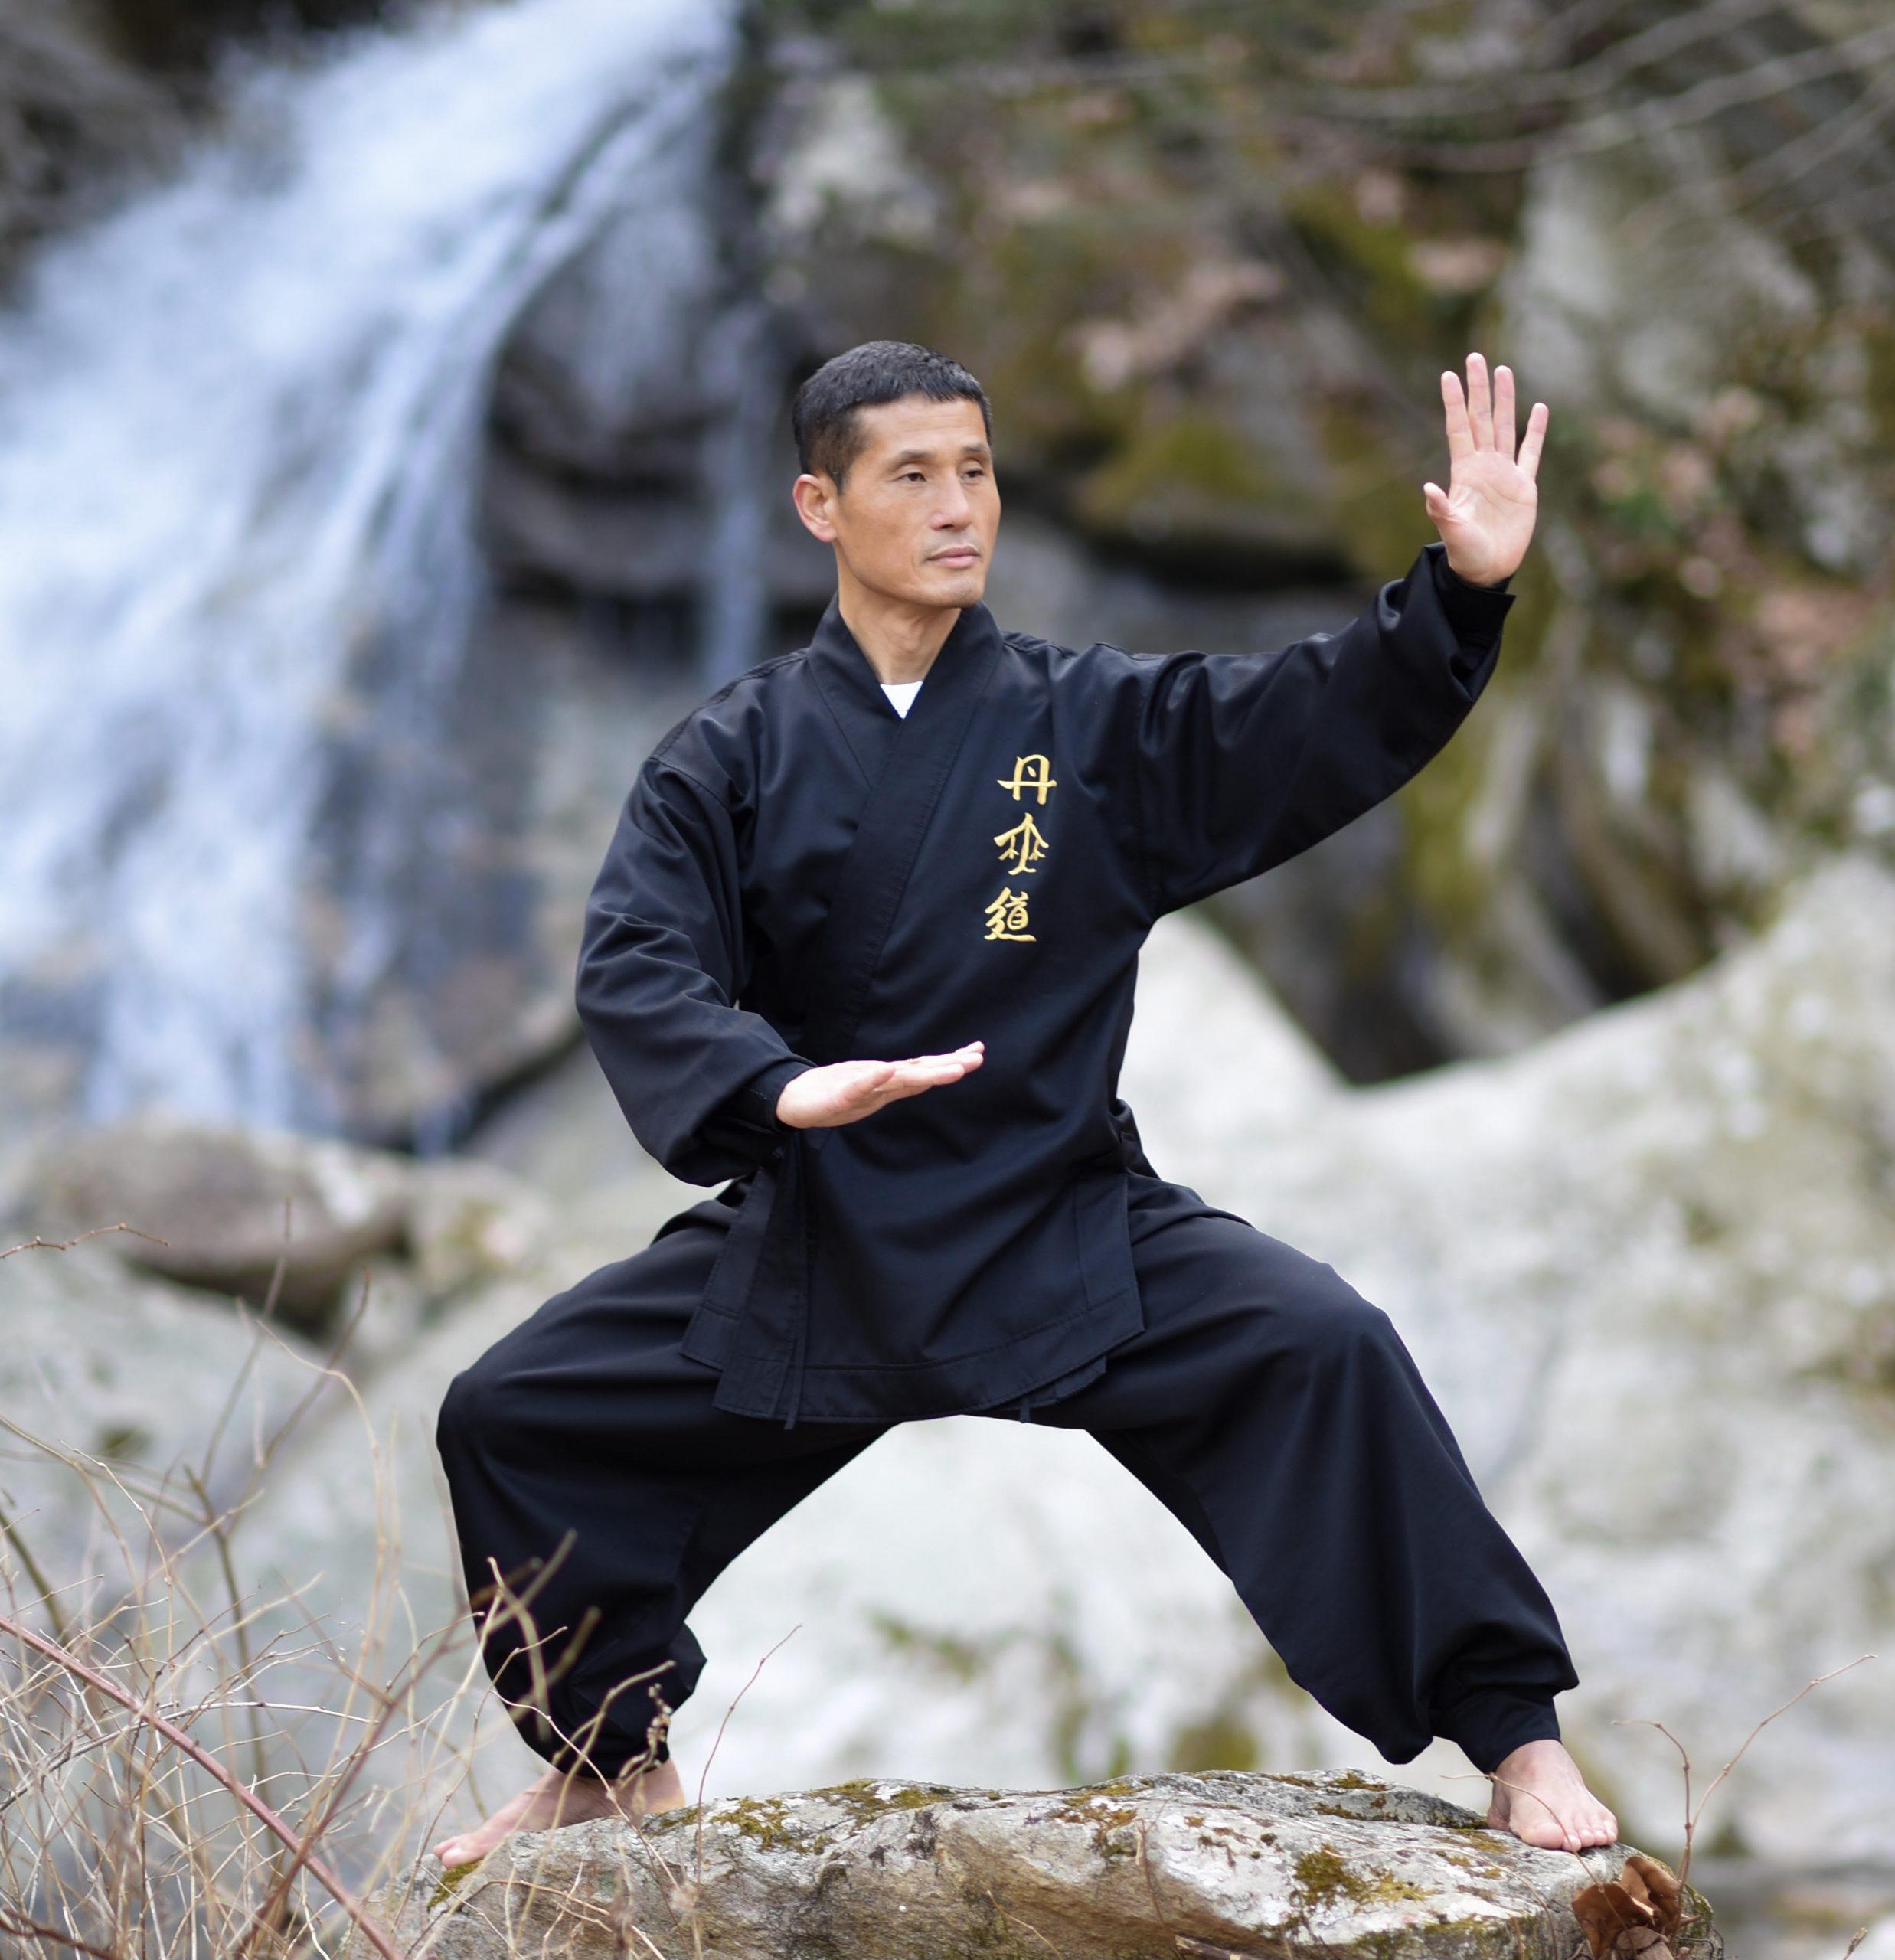 Greetings from Grand Master Yoo